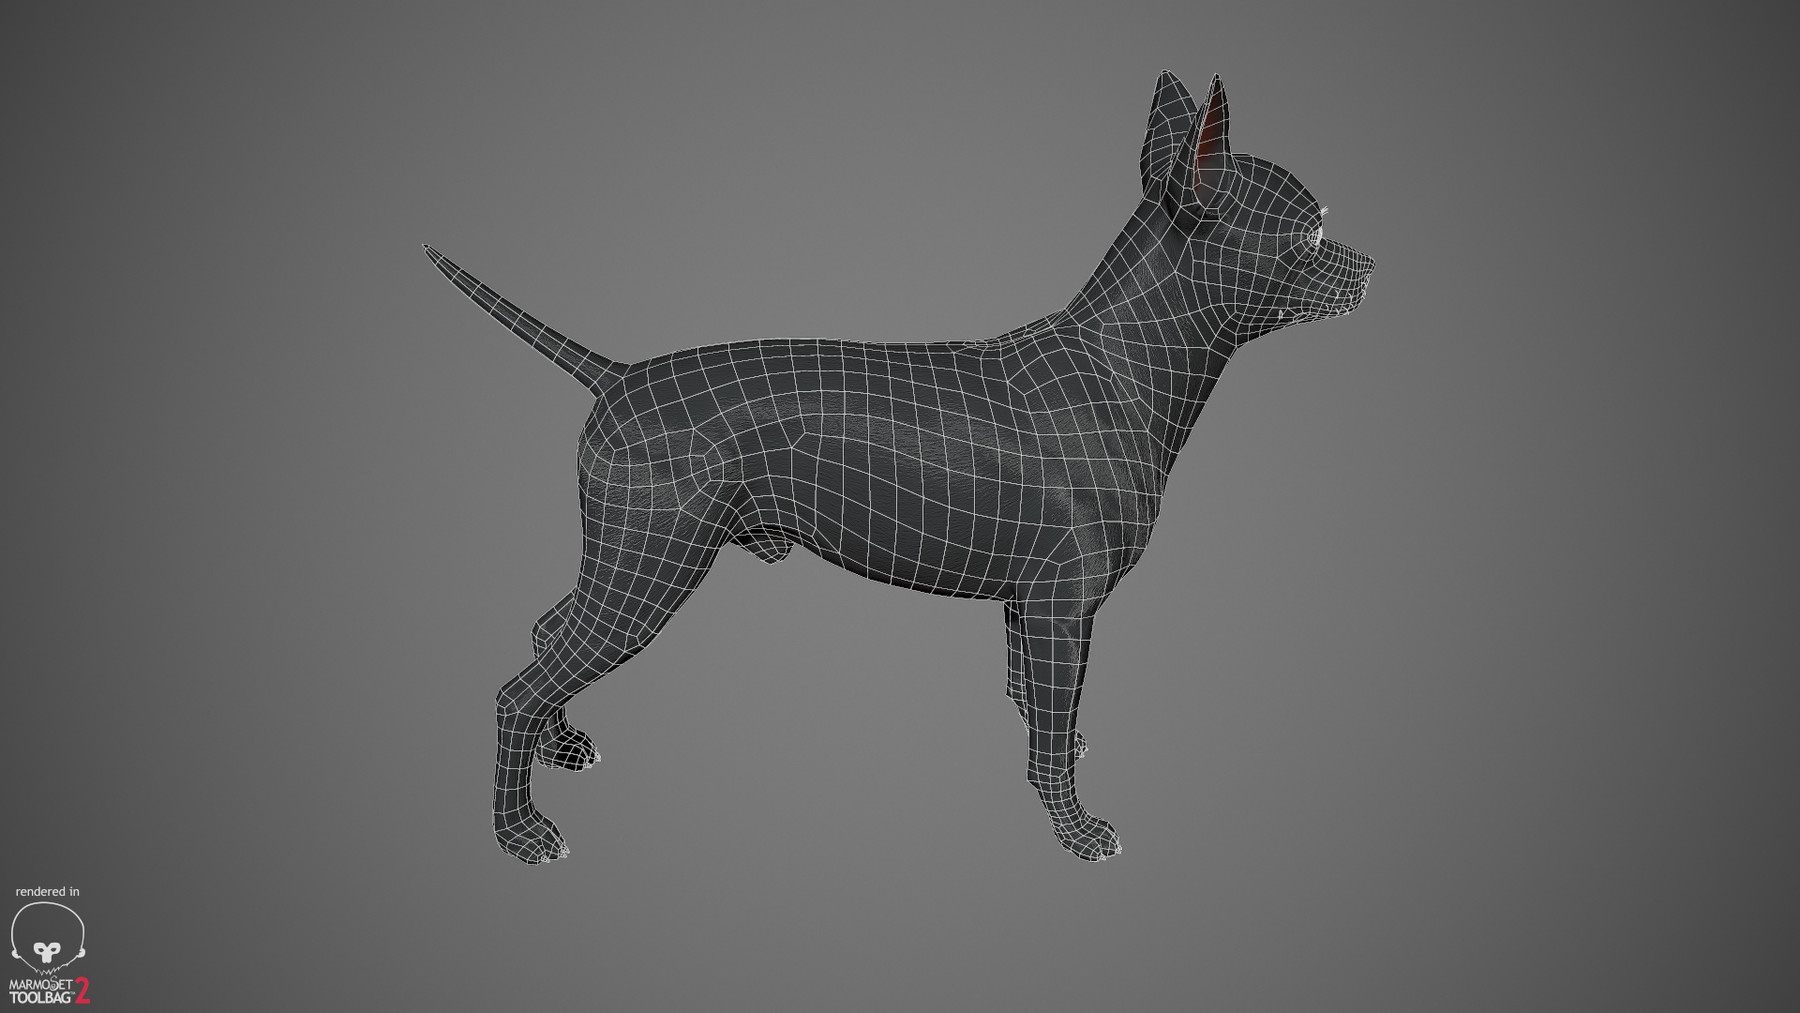 Chihuahua by alexlashko wireframe 03